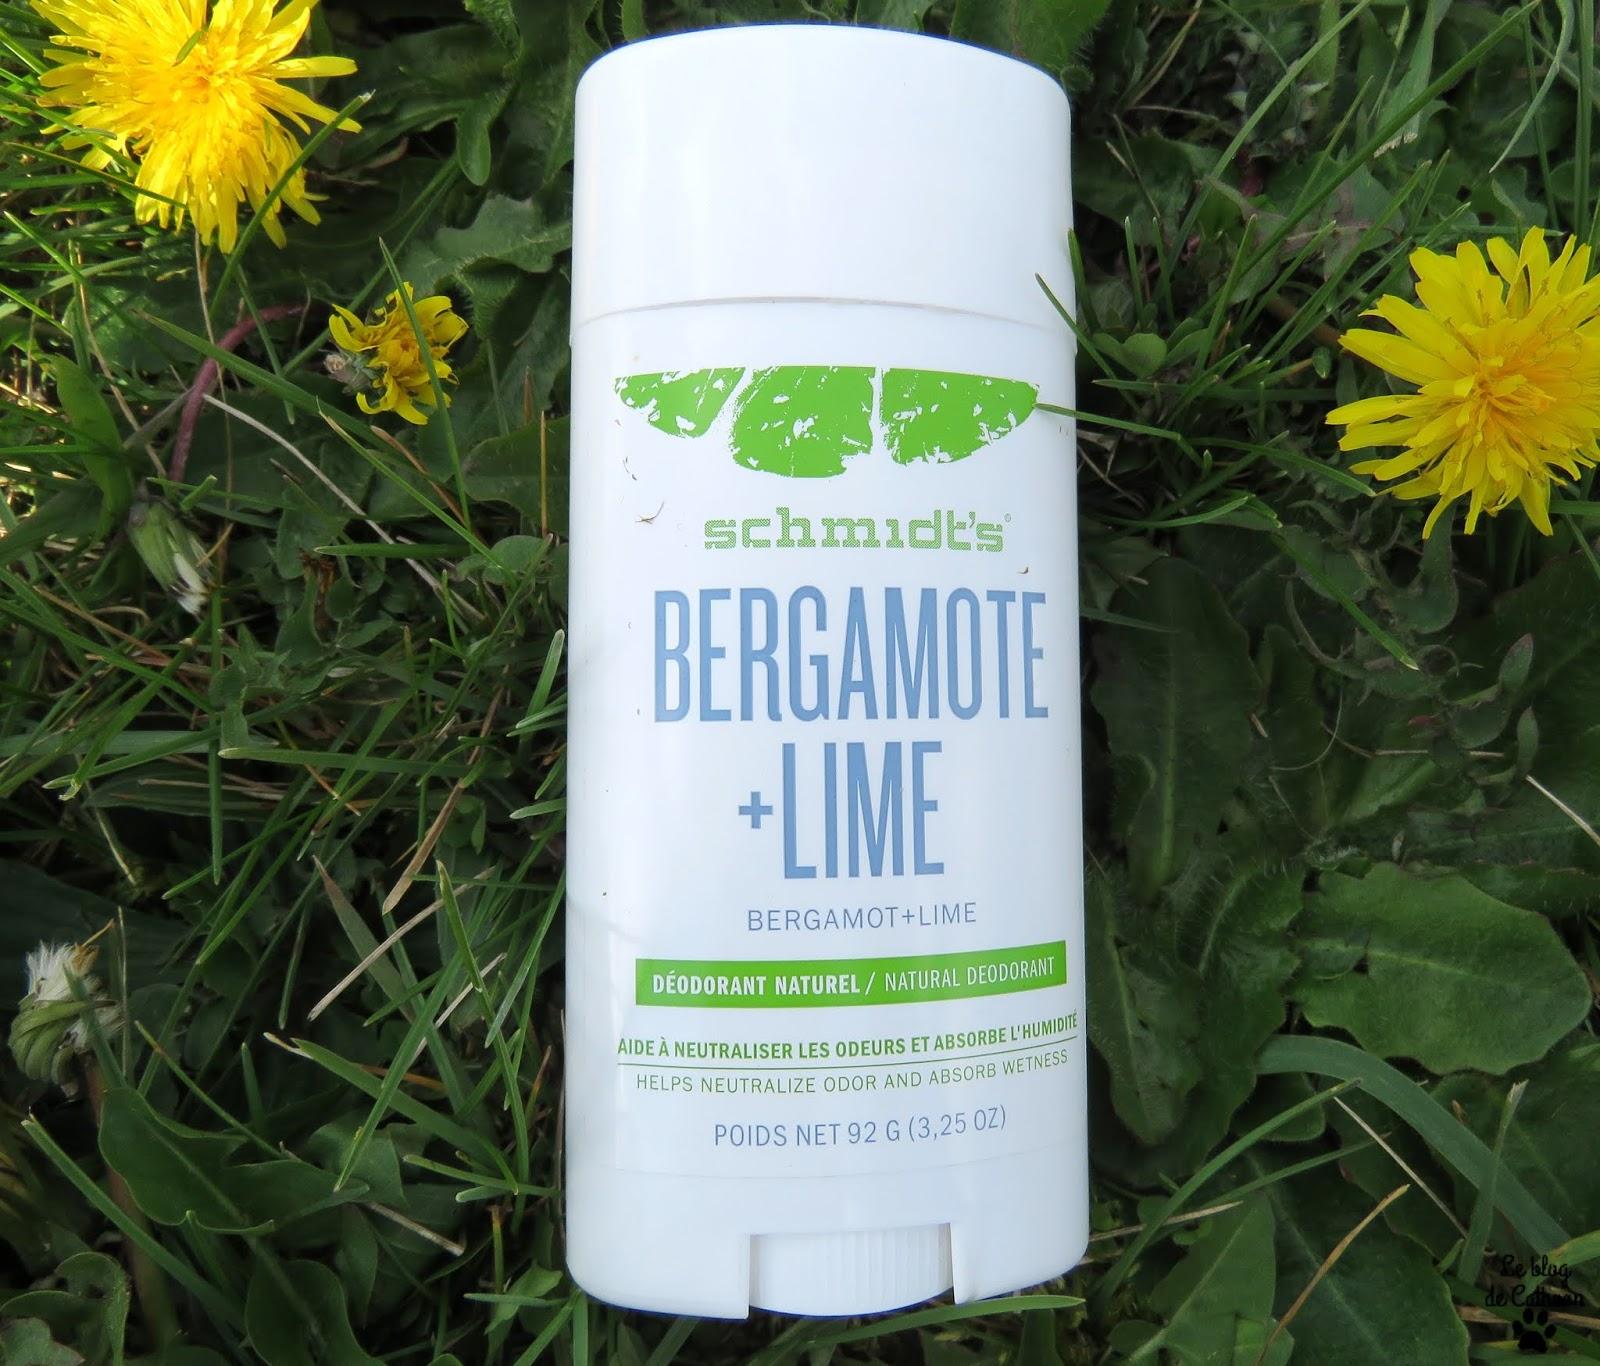 Bergamote + Lime Déodorant Schmidt's